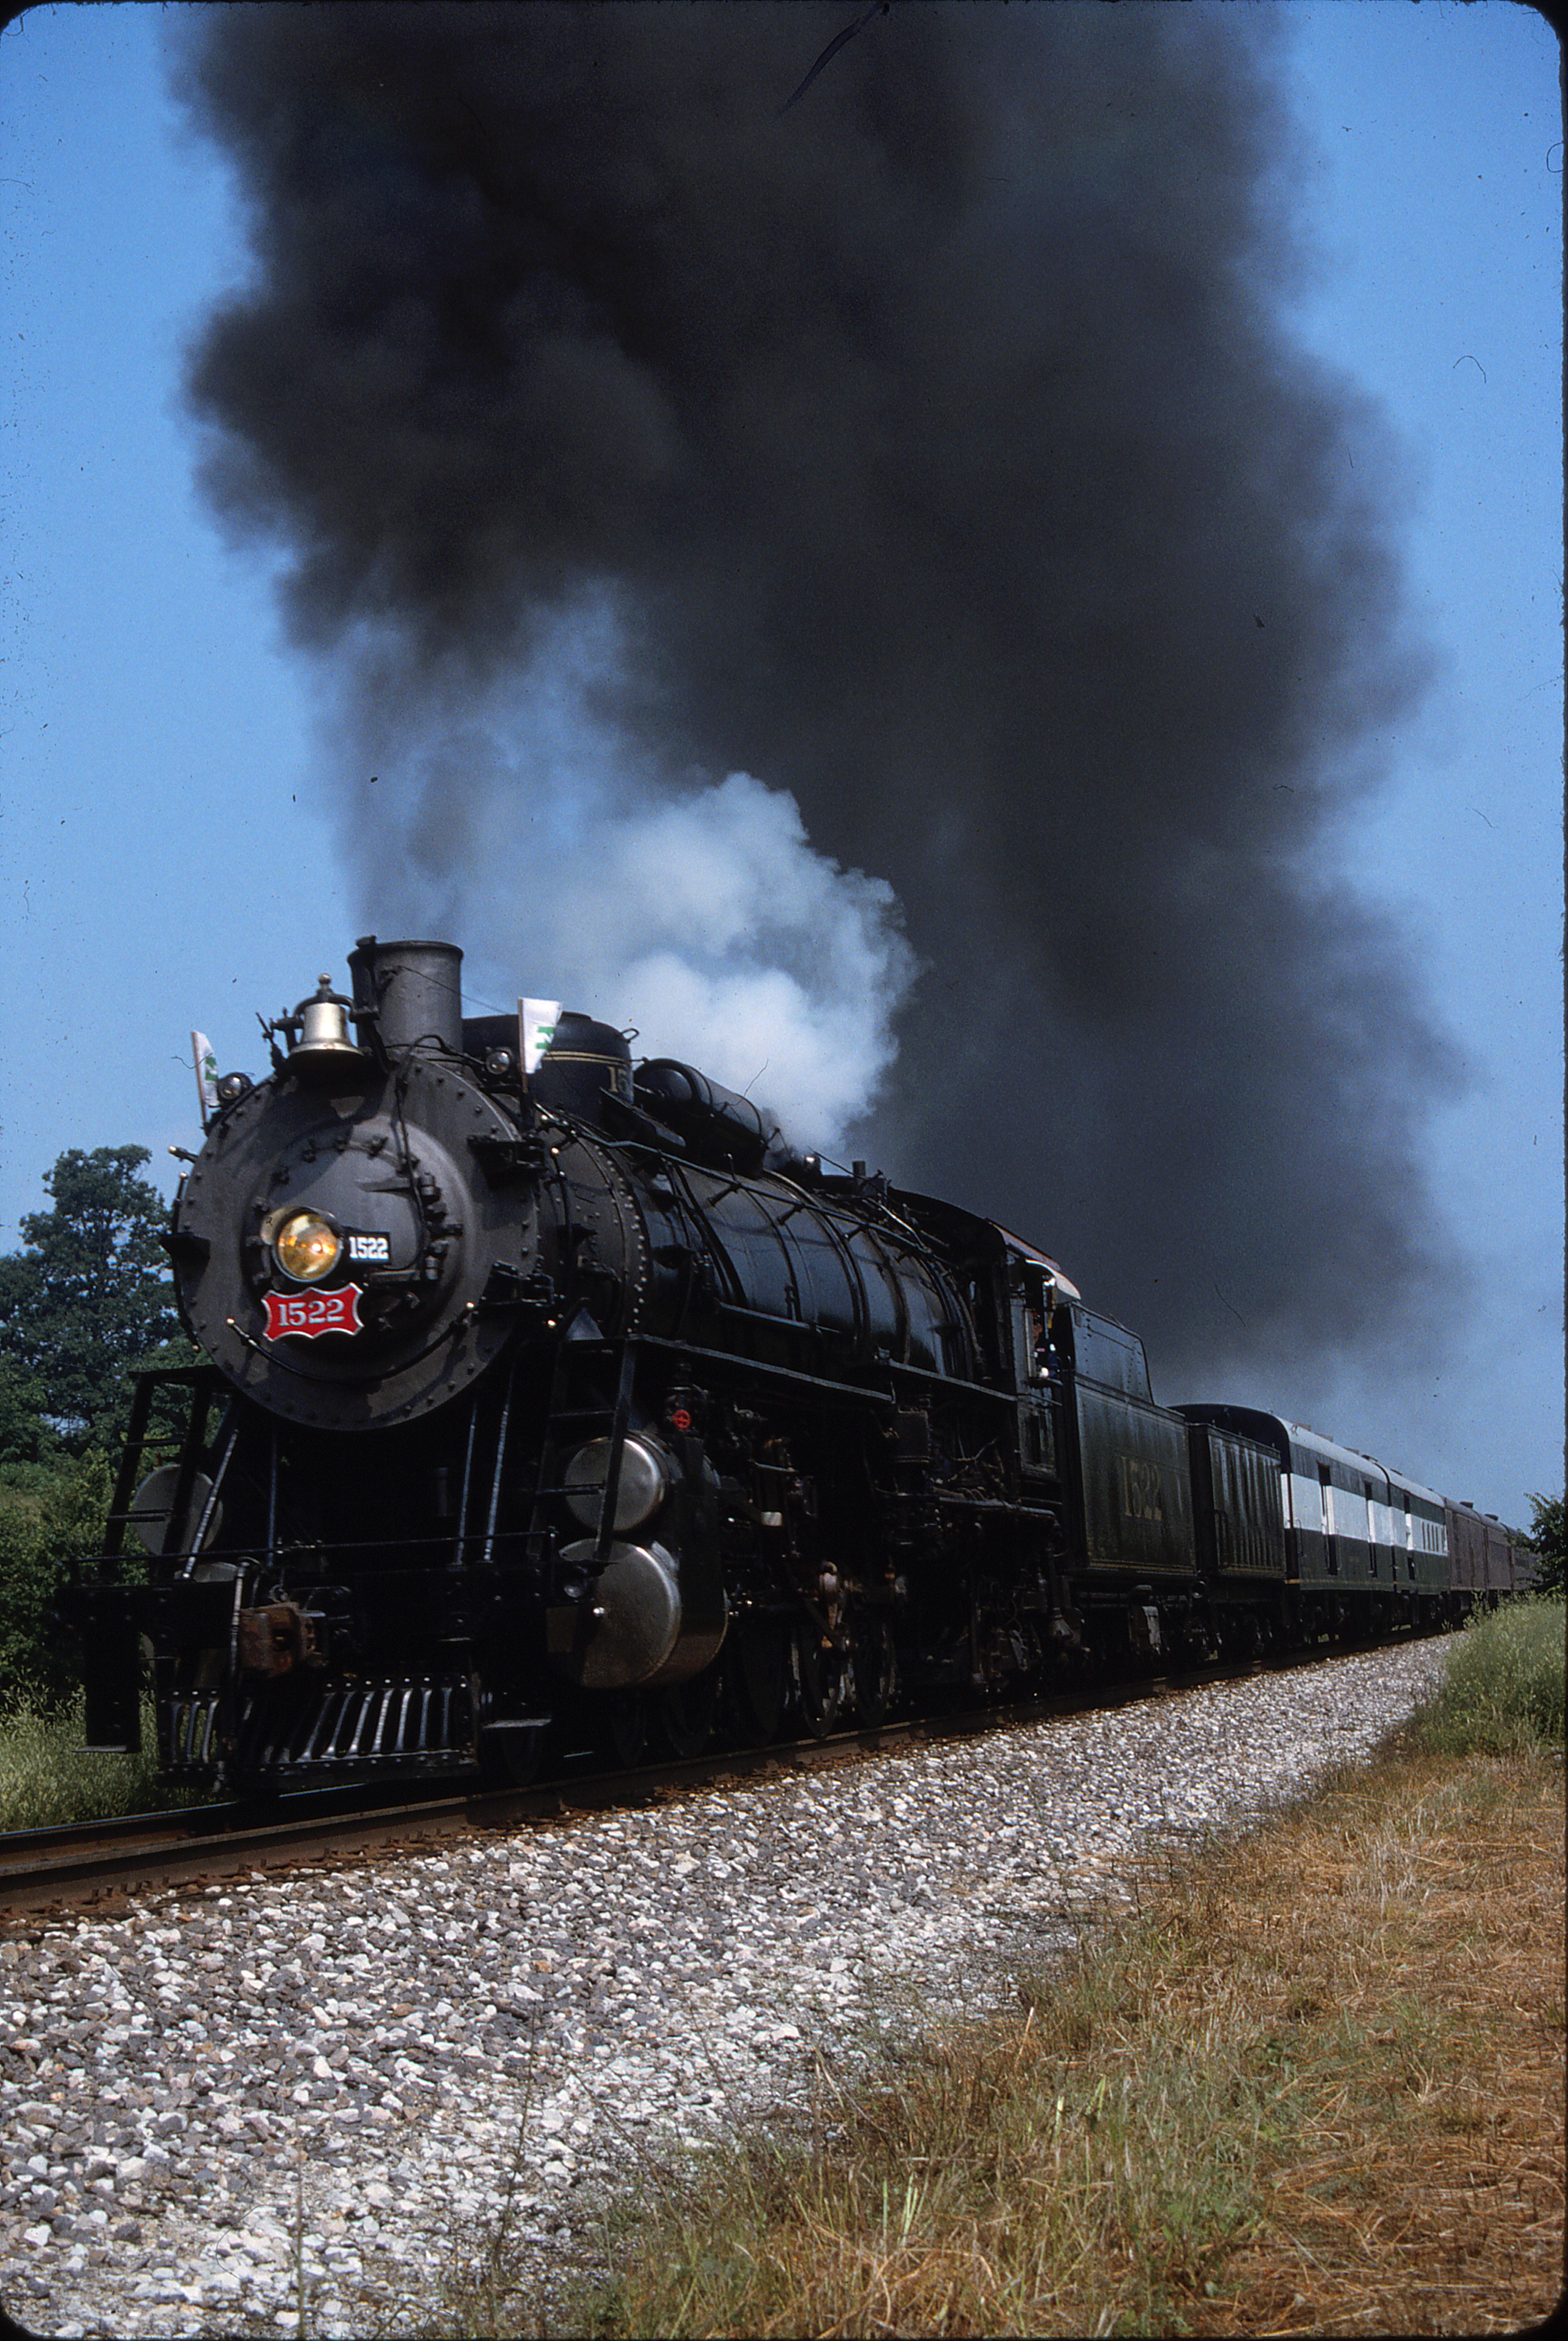 4-8-2 1522 at Sargent, Missouri on June 19, 1994 (Phil Gosney)